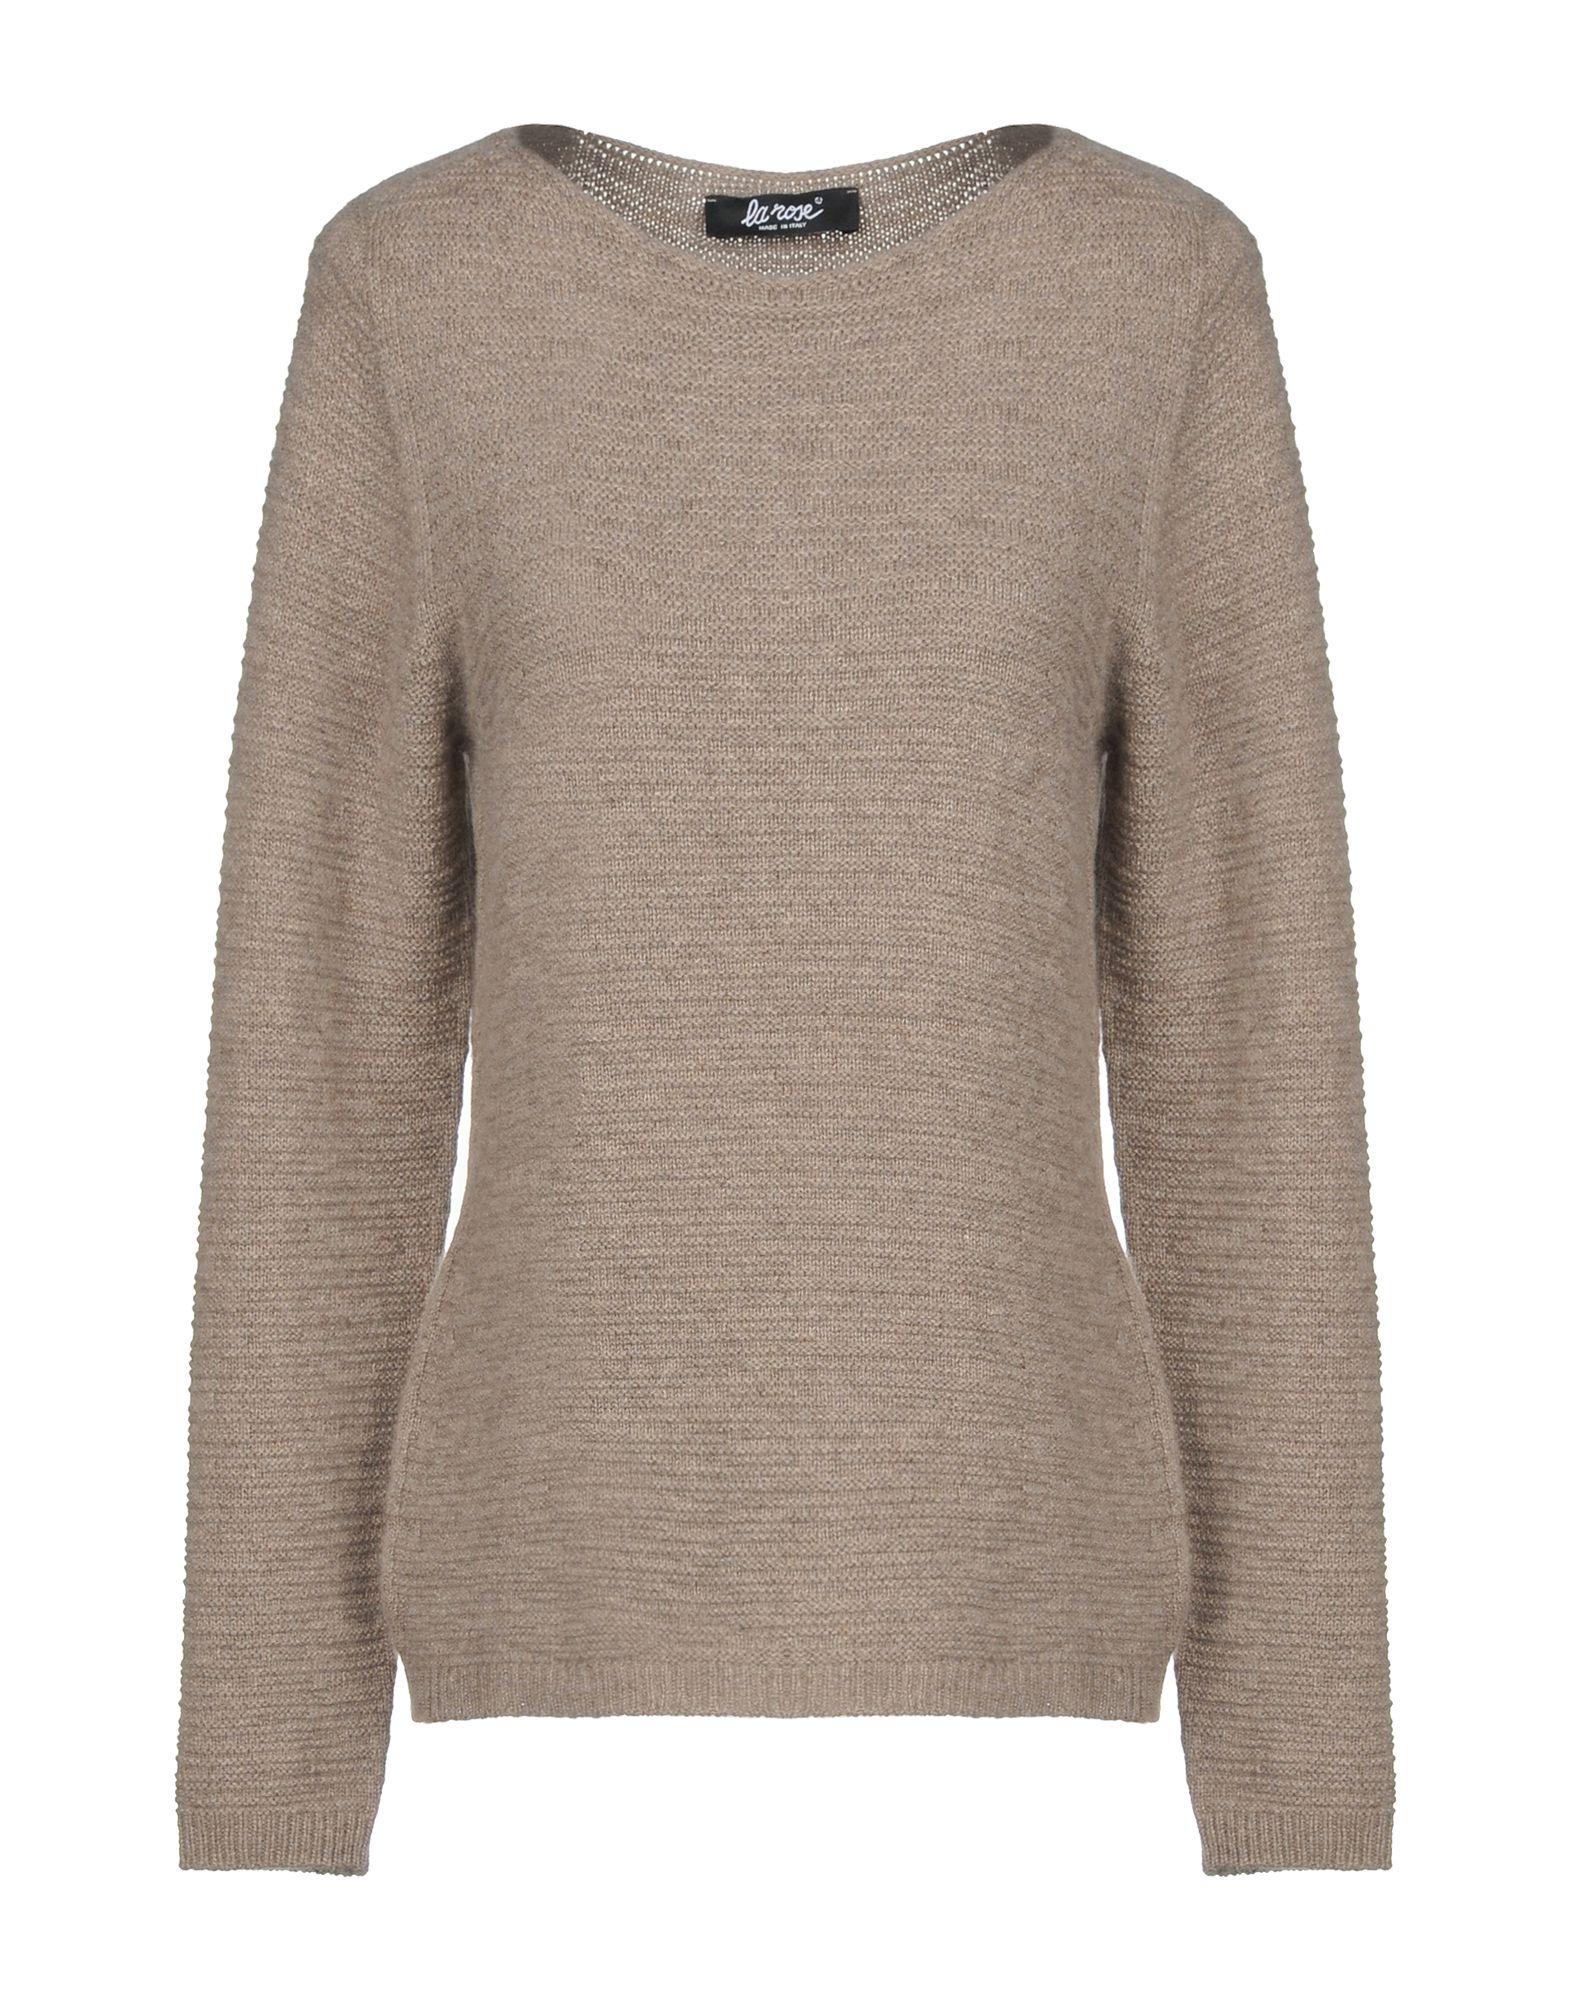 LA ROSE Свитер rose carmine свитер